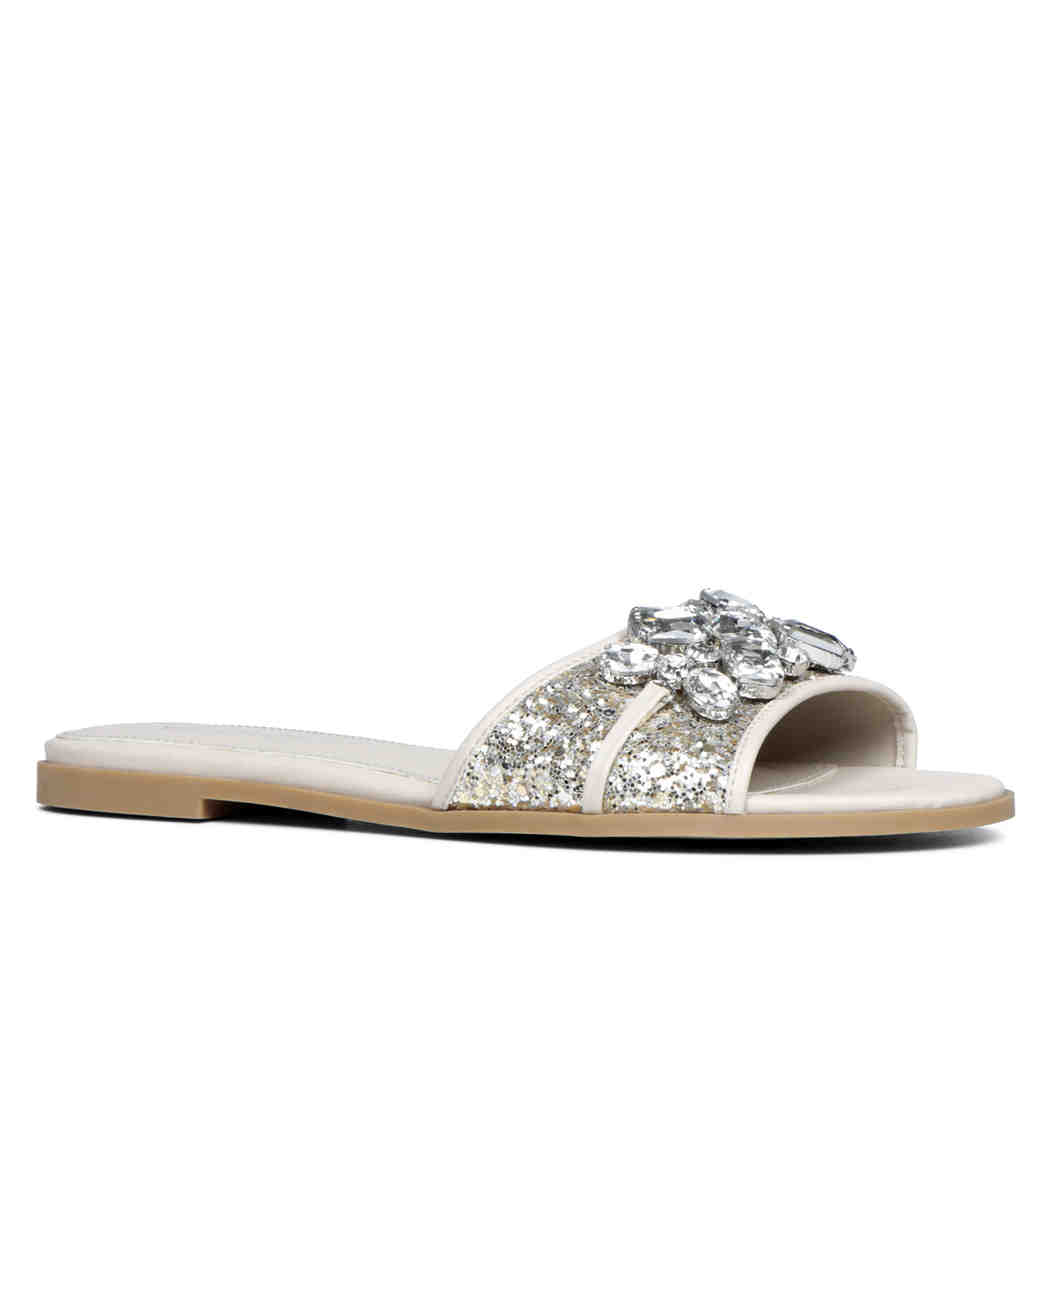 summer-wedding-shoes-aldo-brodkin-0515.jpg